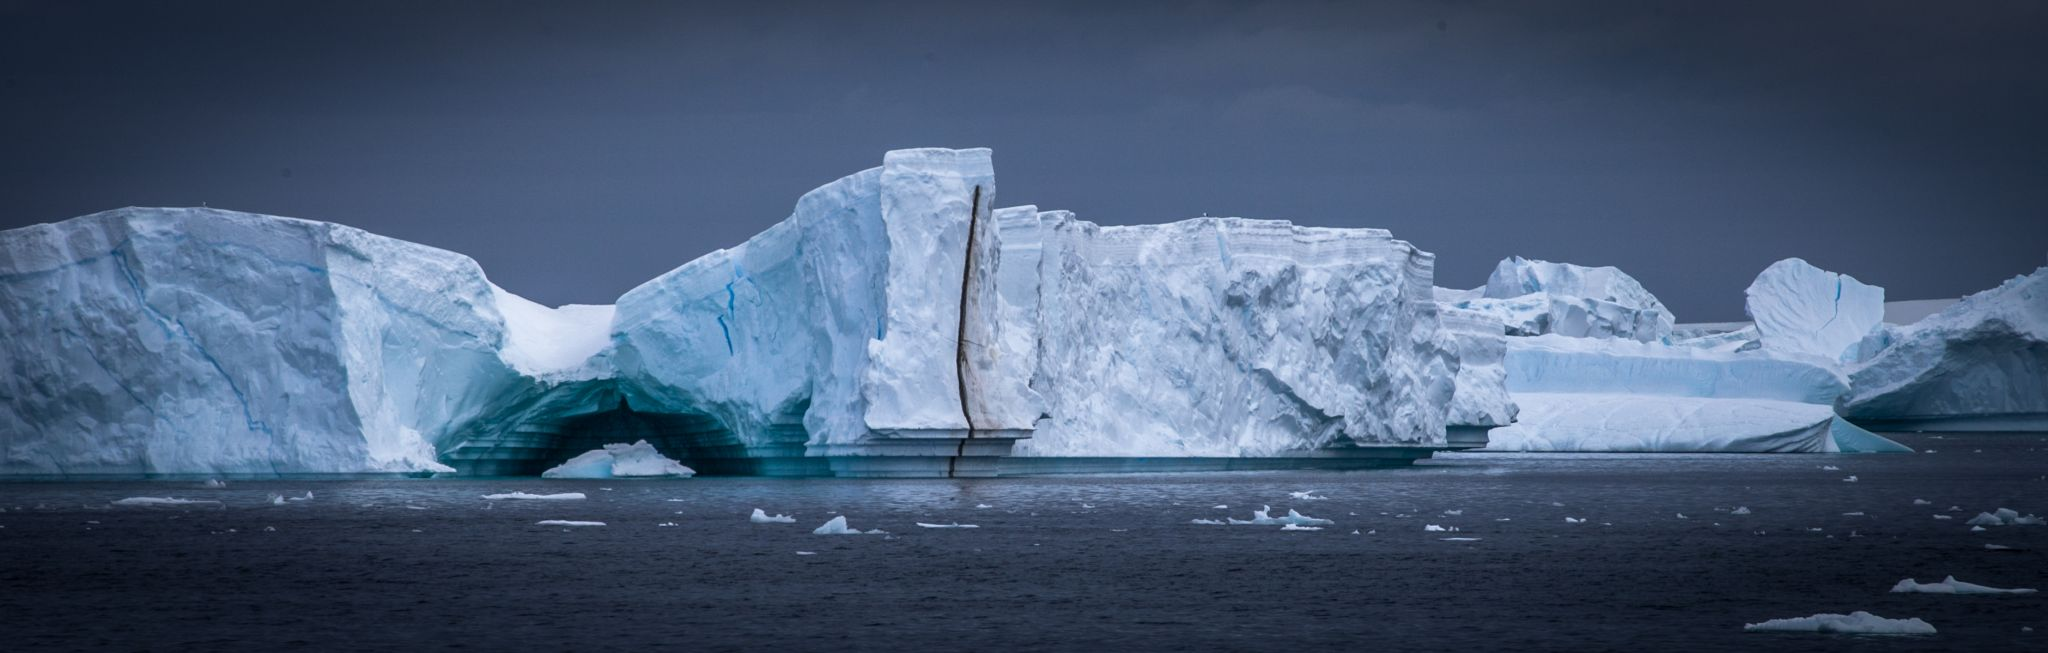 Iceberg Alley Antarctica, Antarctica